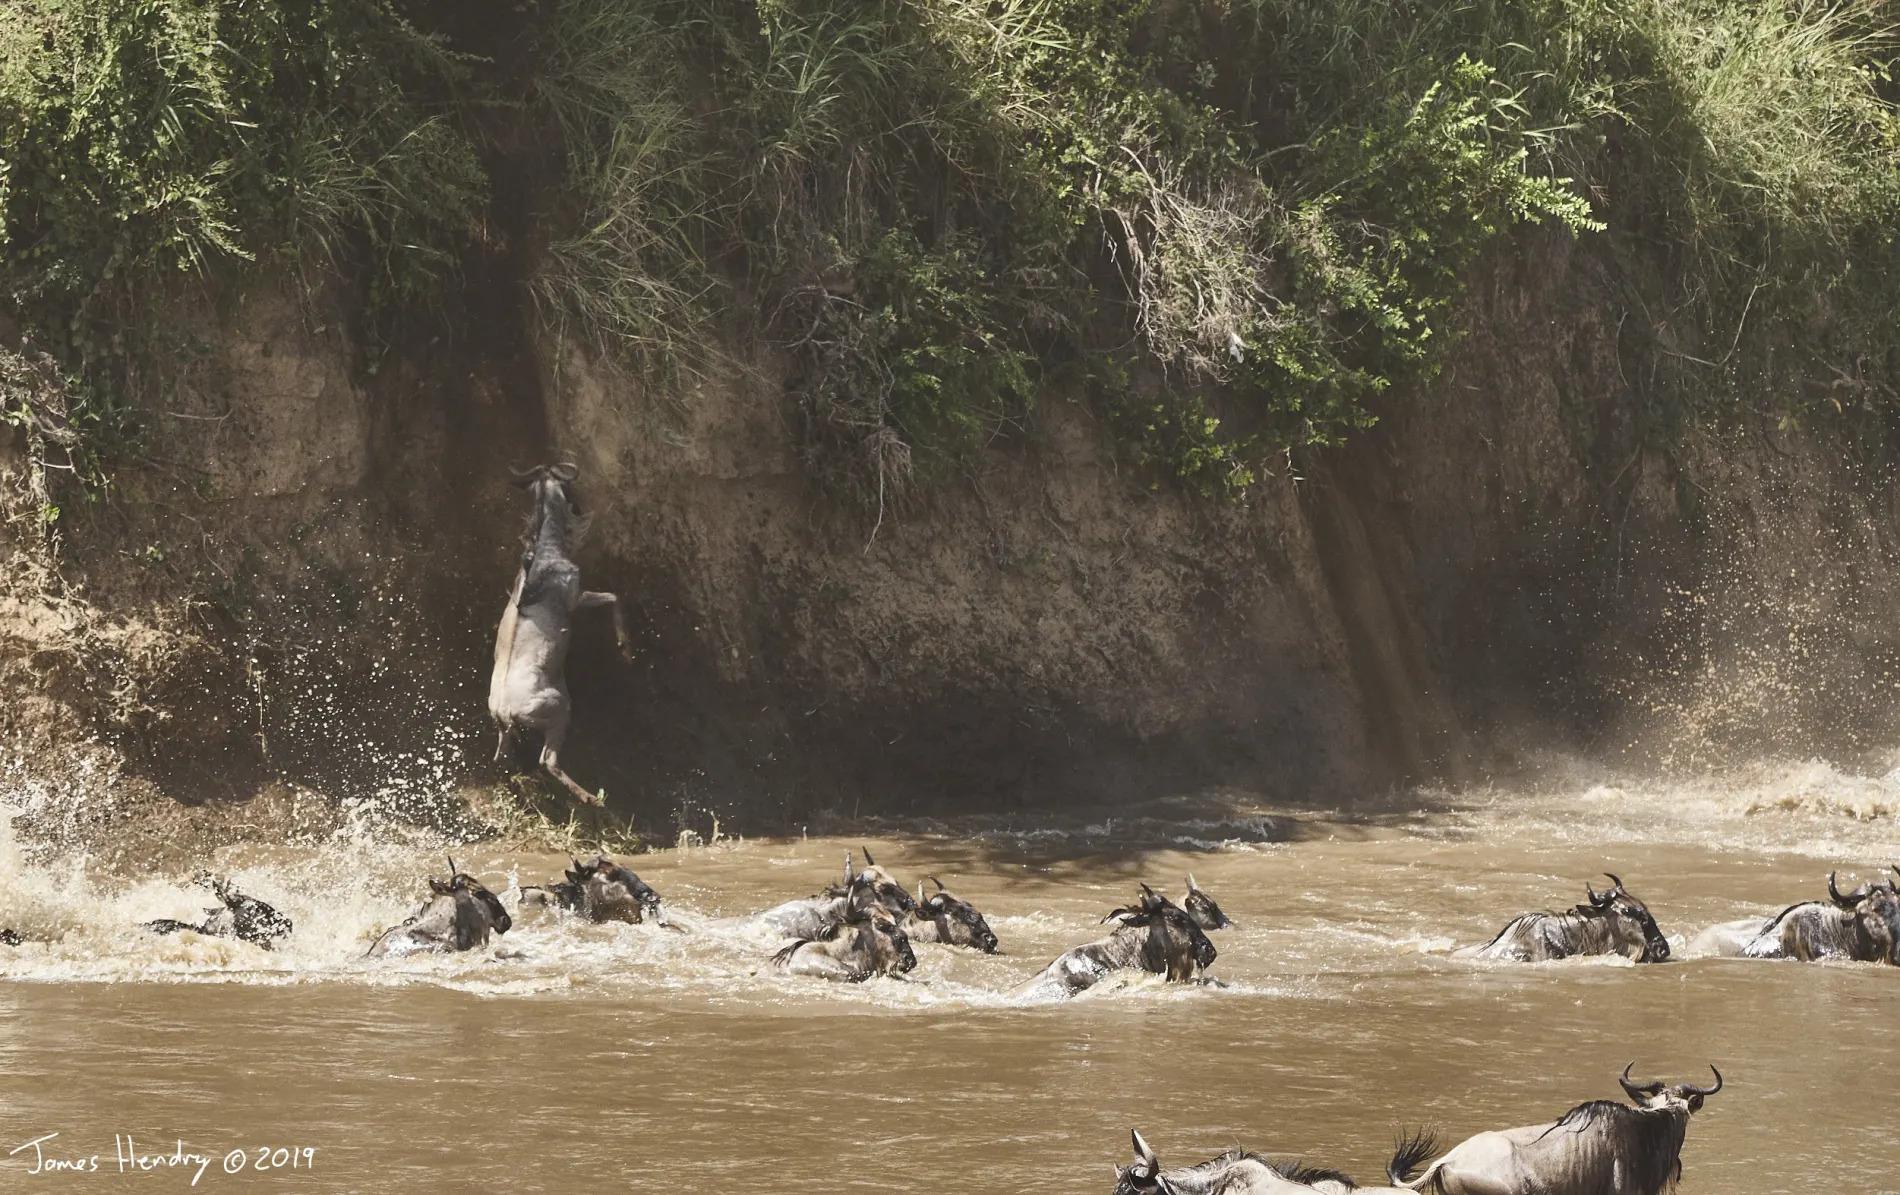 James Hendry_river crossing 2